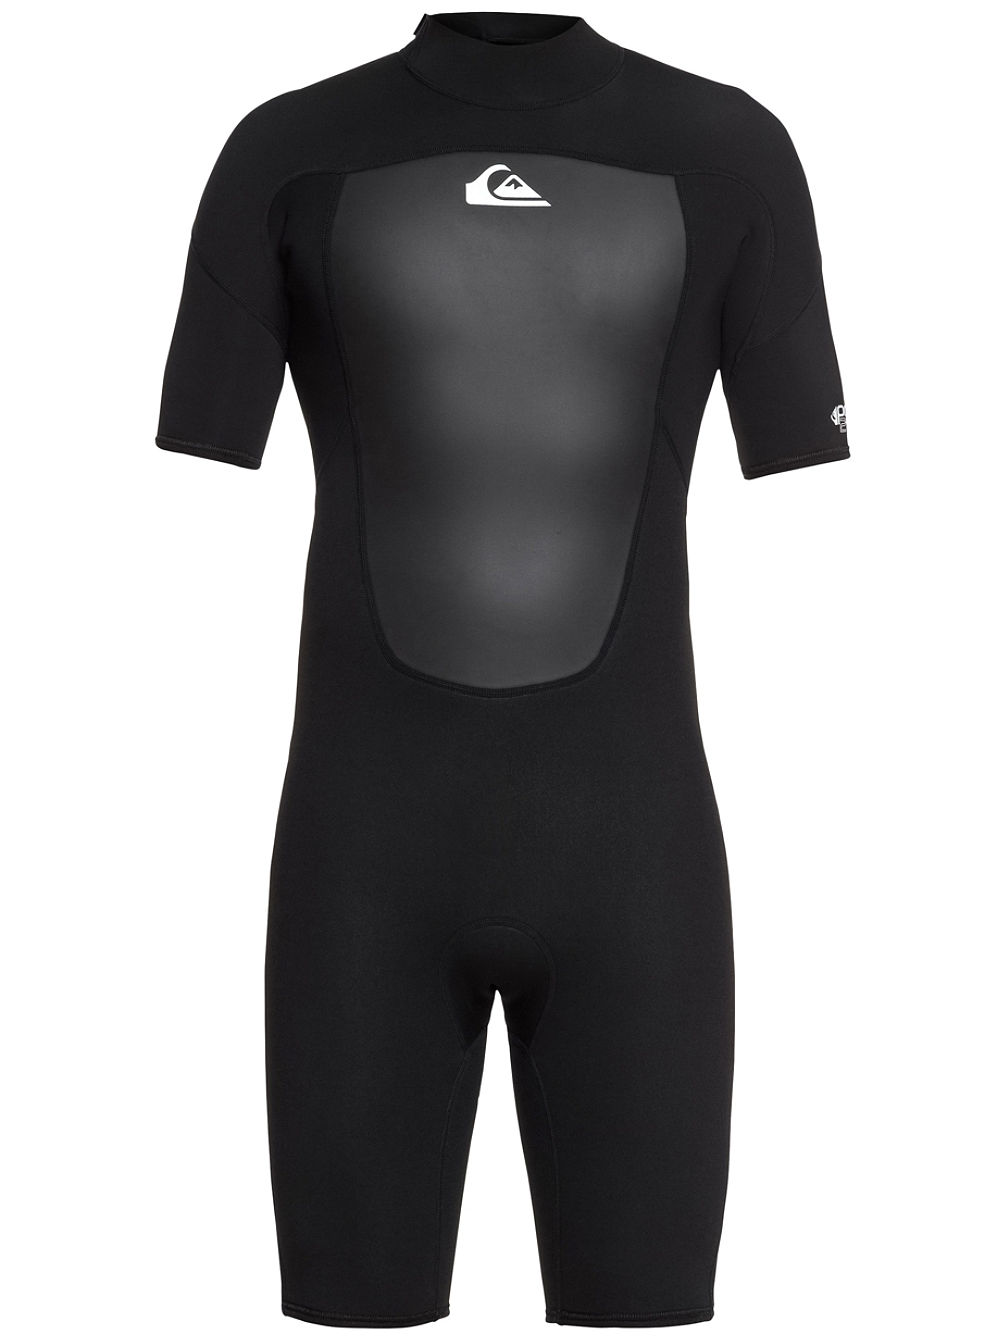 29ecdbd6ae Buy Quiksilver 2 2 Prologue Back Zip SS Flt Wetsuit Wetsuit online ...